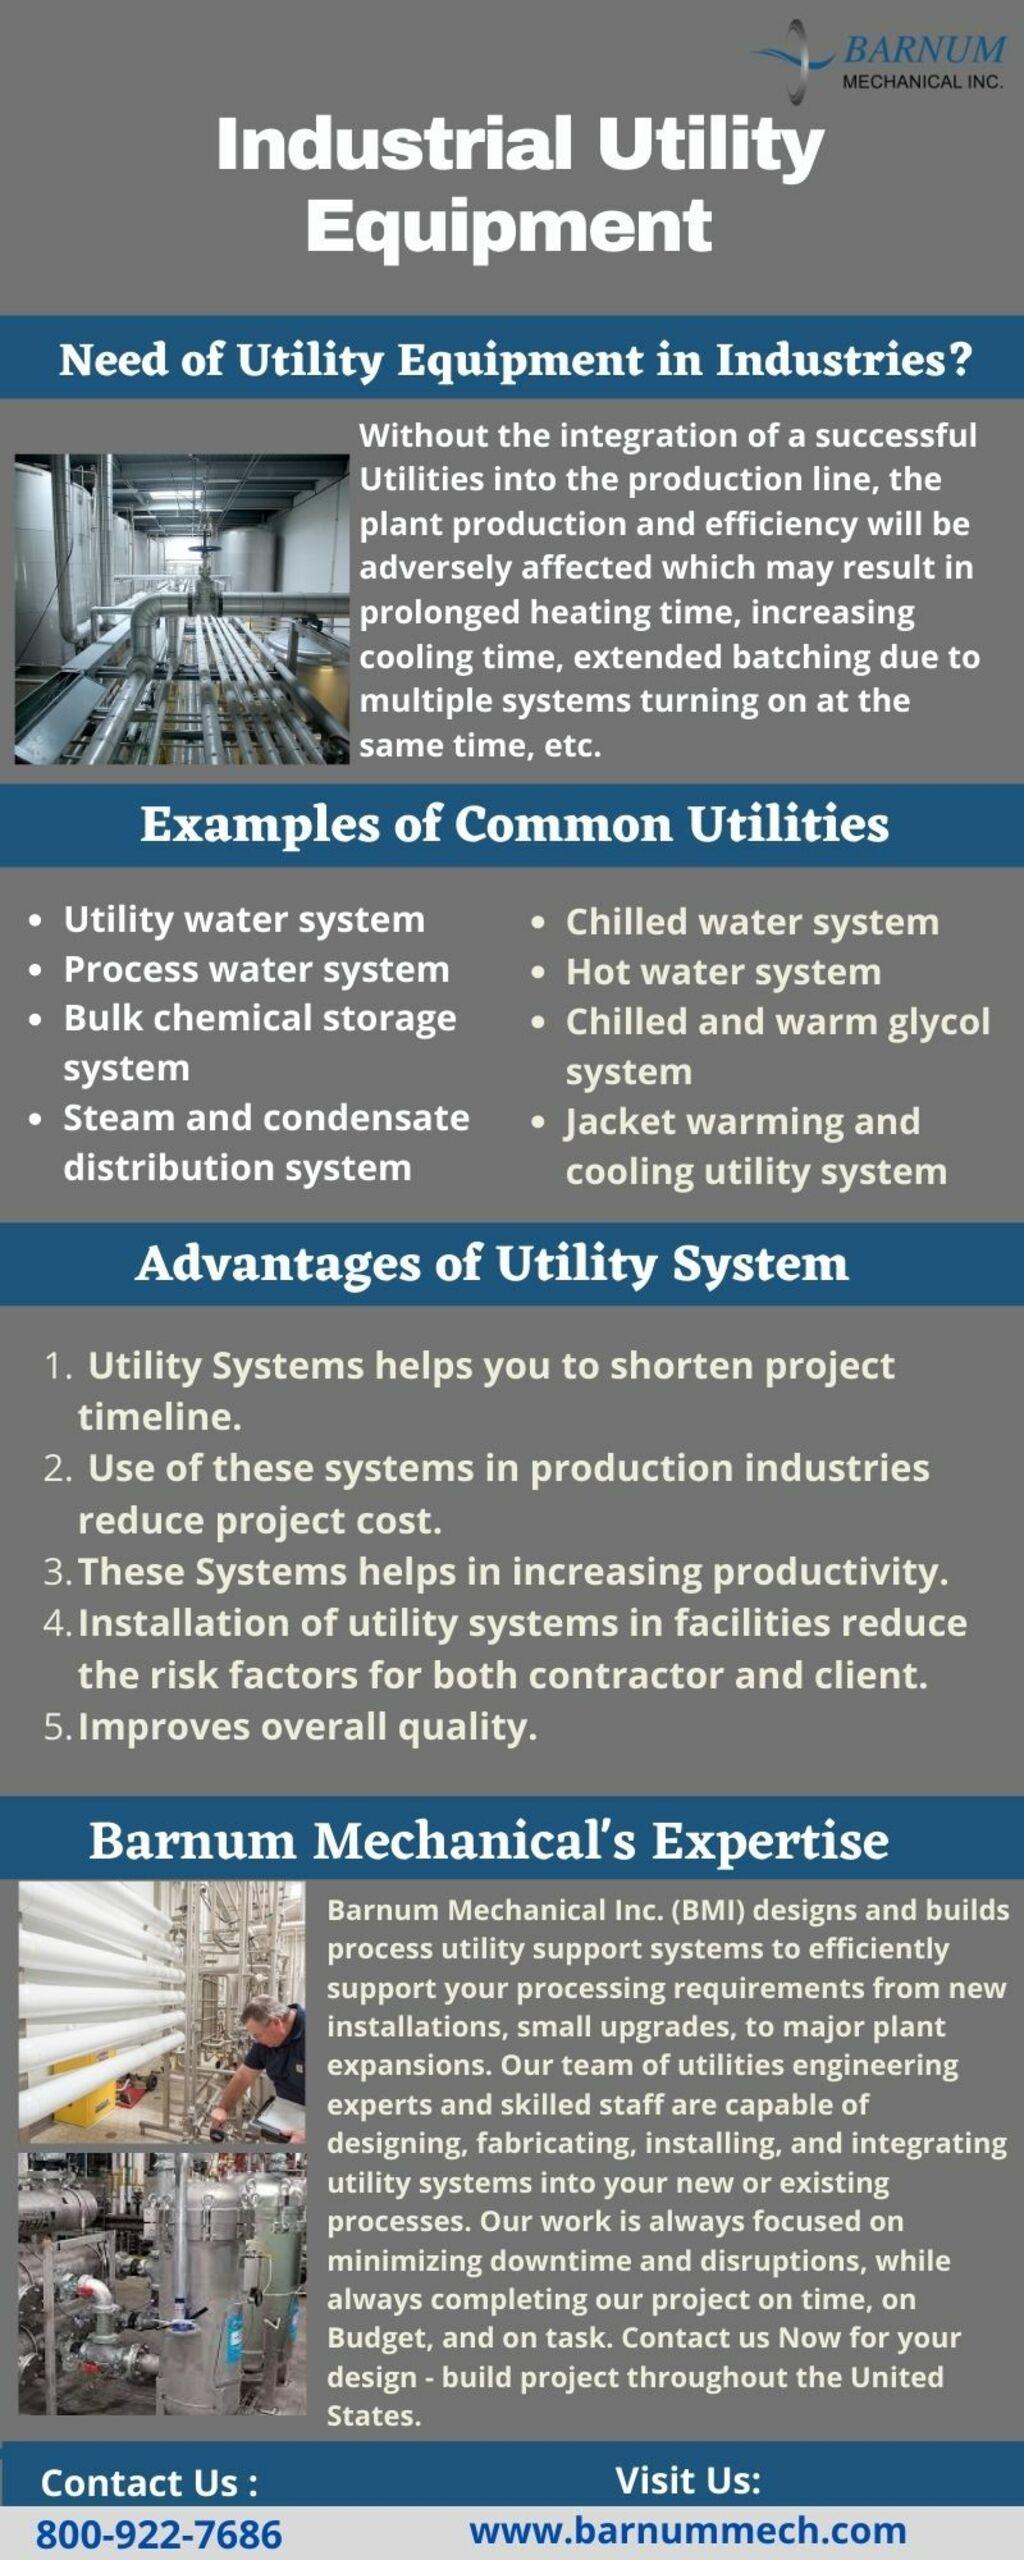 Industrial Utility Equipment Design and Fabrication - Barnum... via Barnum Mechanical